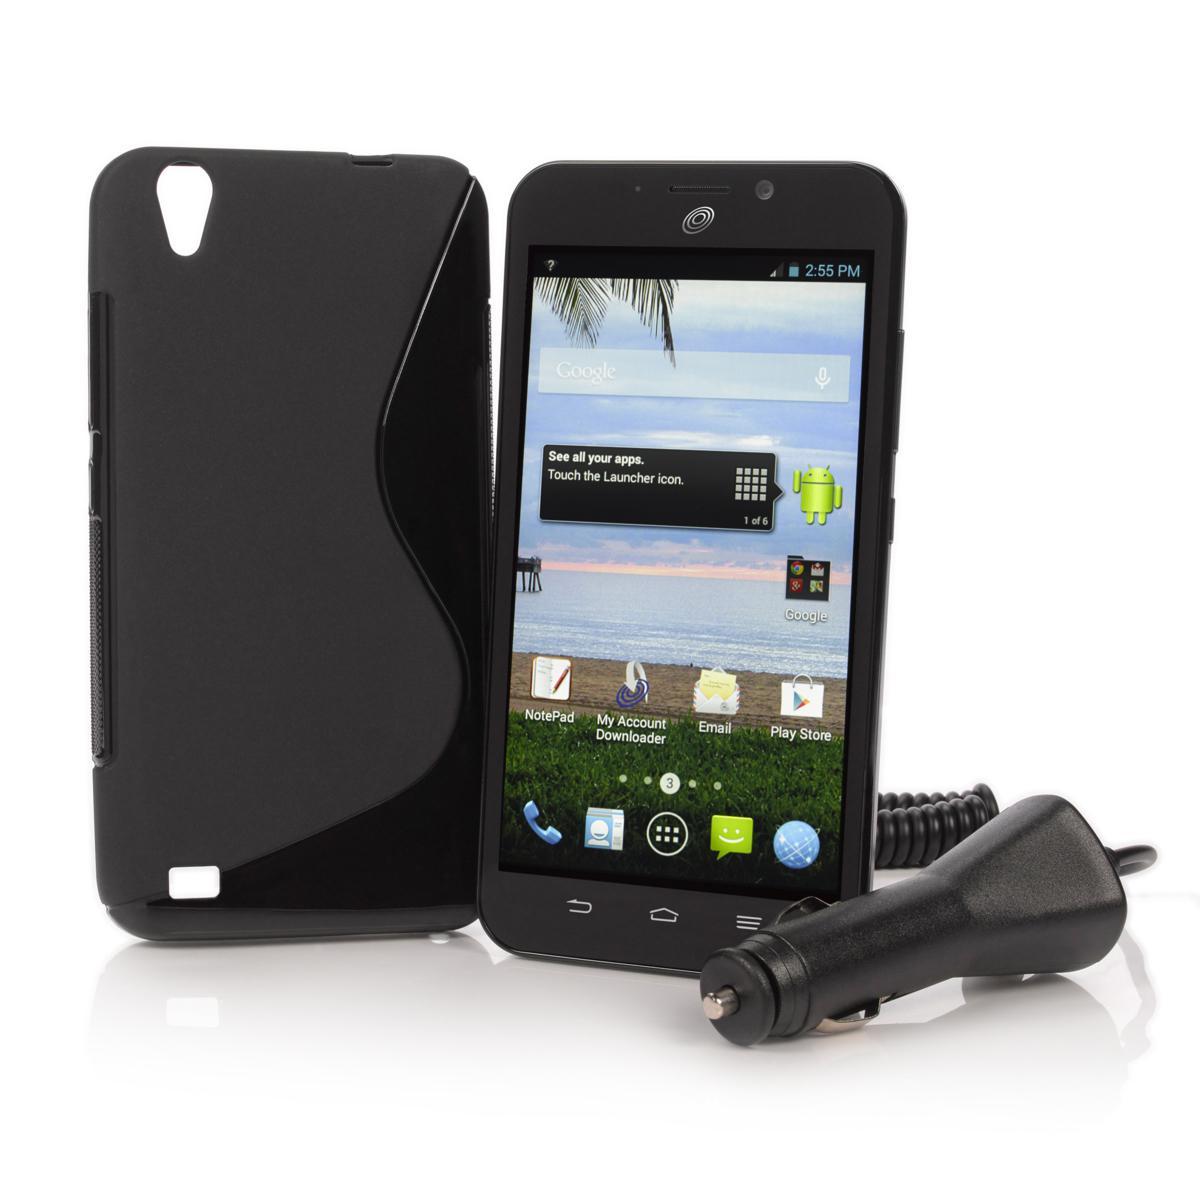 TracFone ZTE Quartz Smartphone + 1200 Minutes/Text/Data  $60 w/ Visa Checkout & More